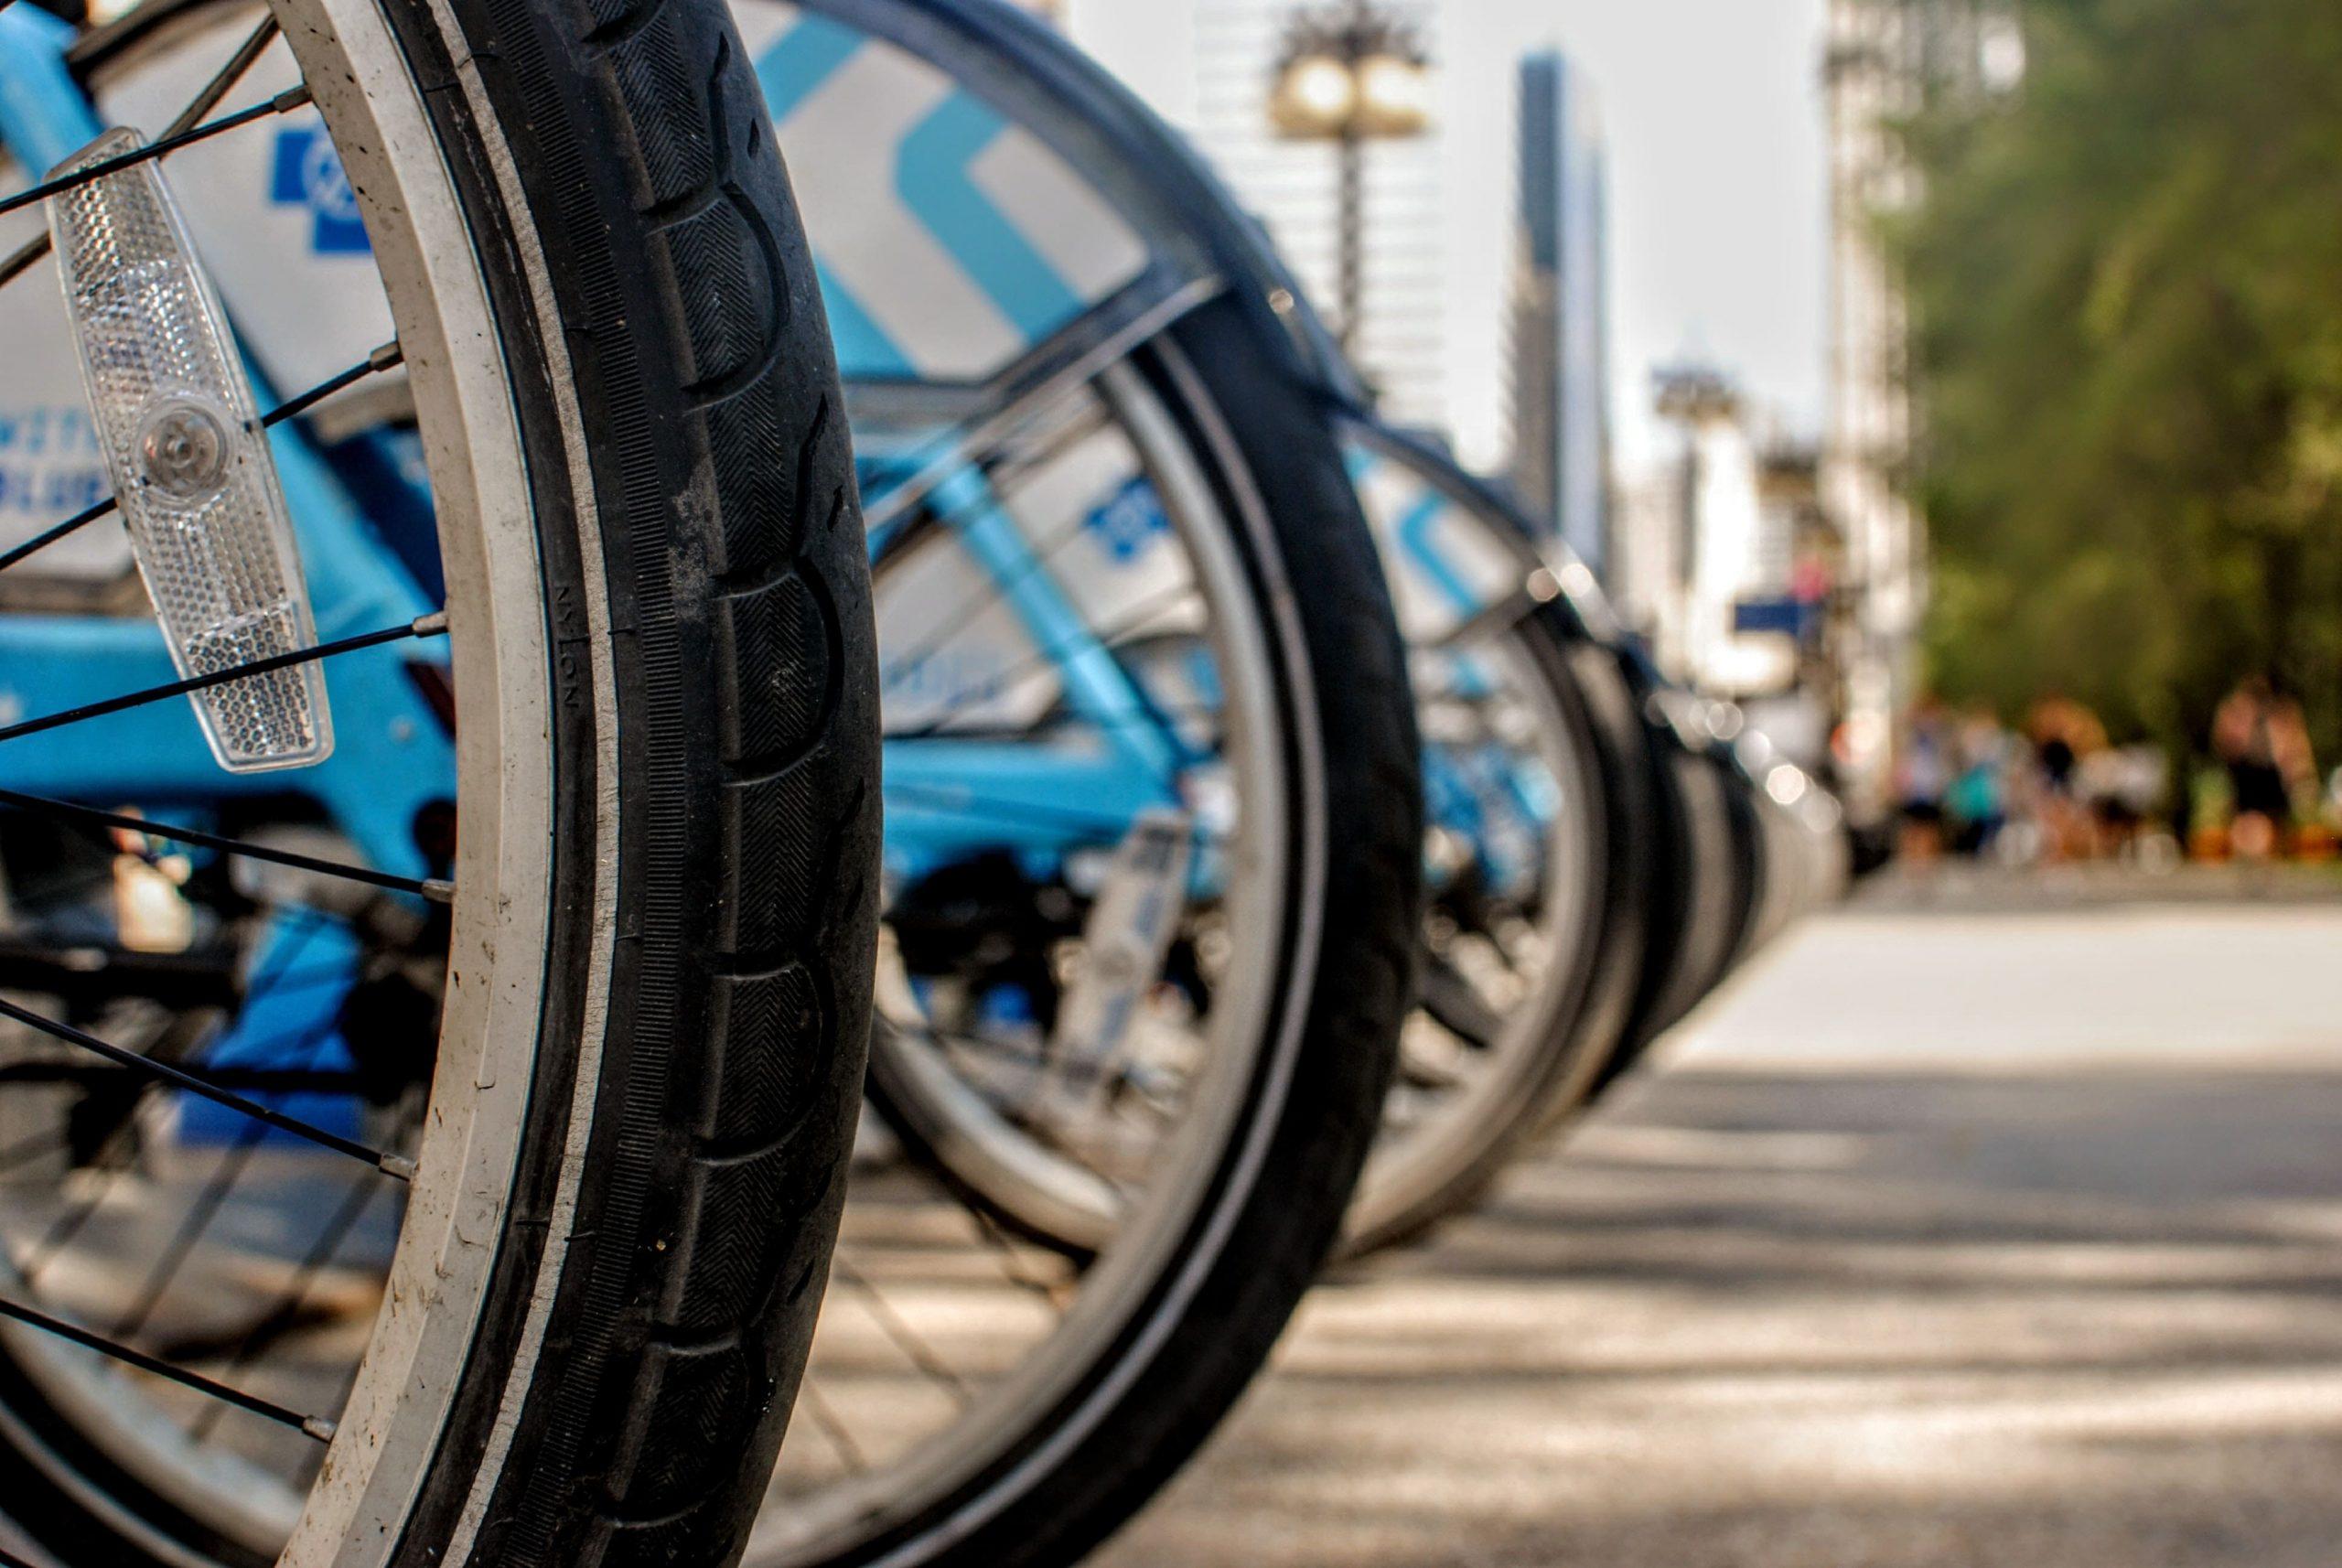 row of rental bikes in city